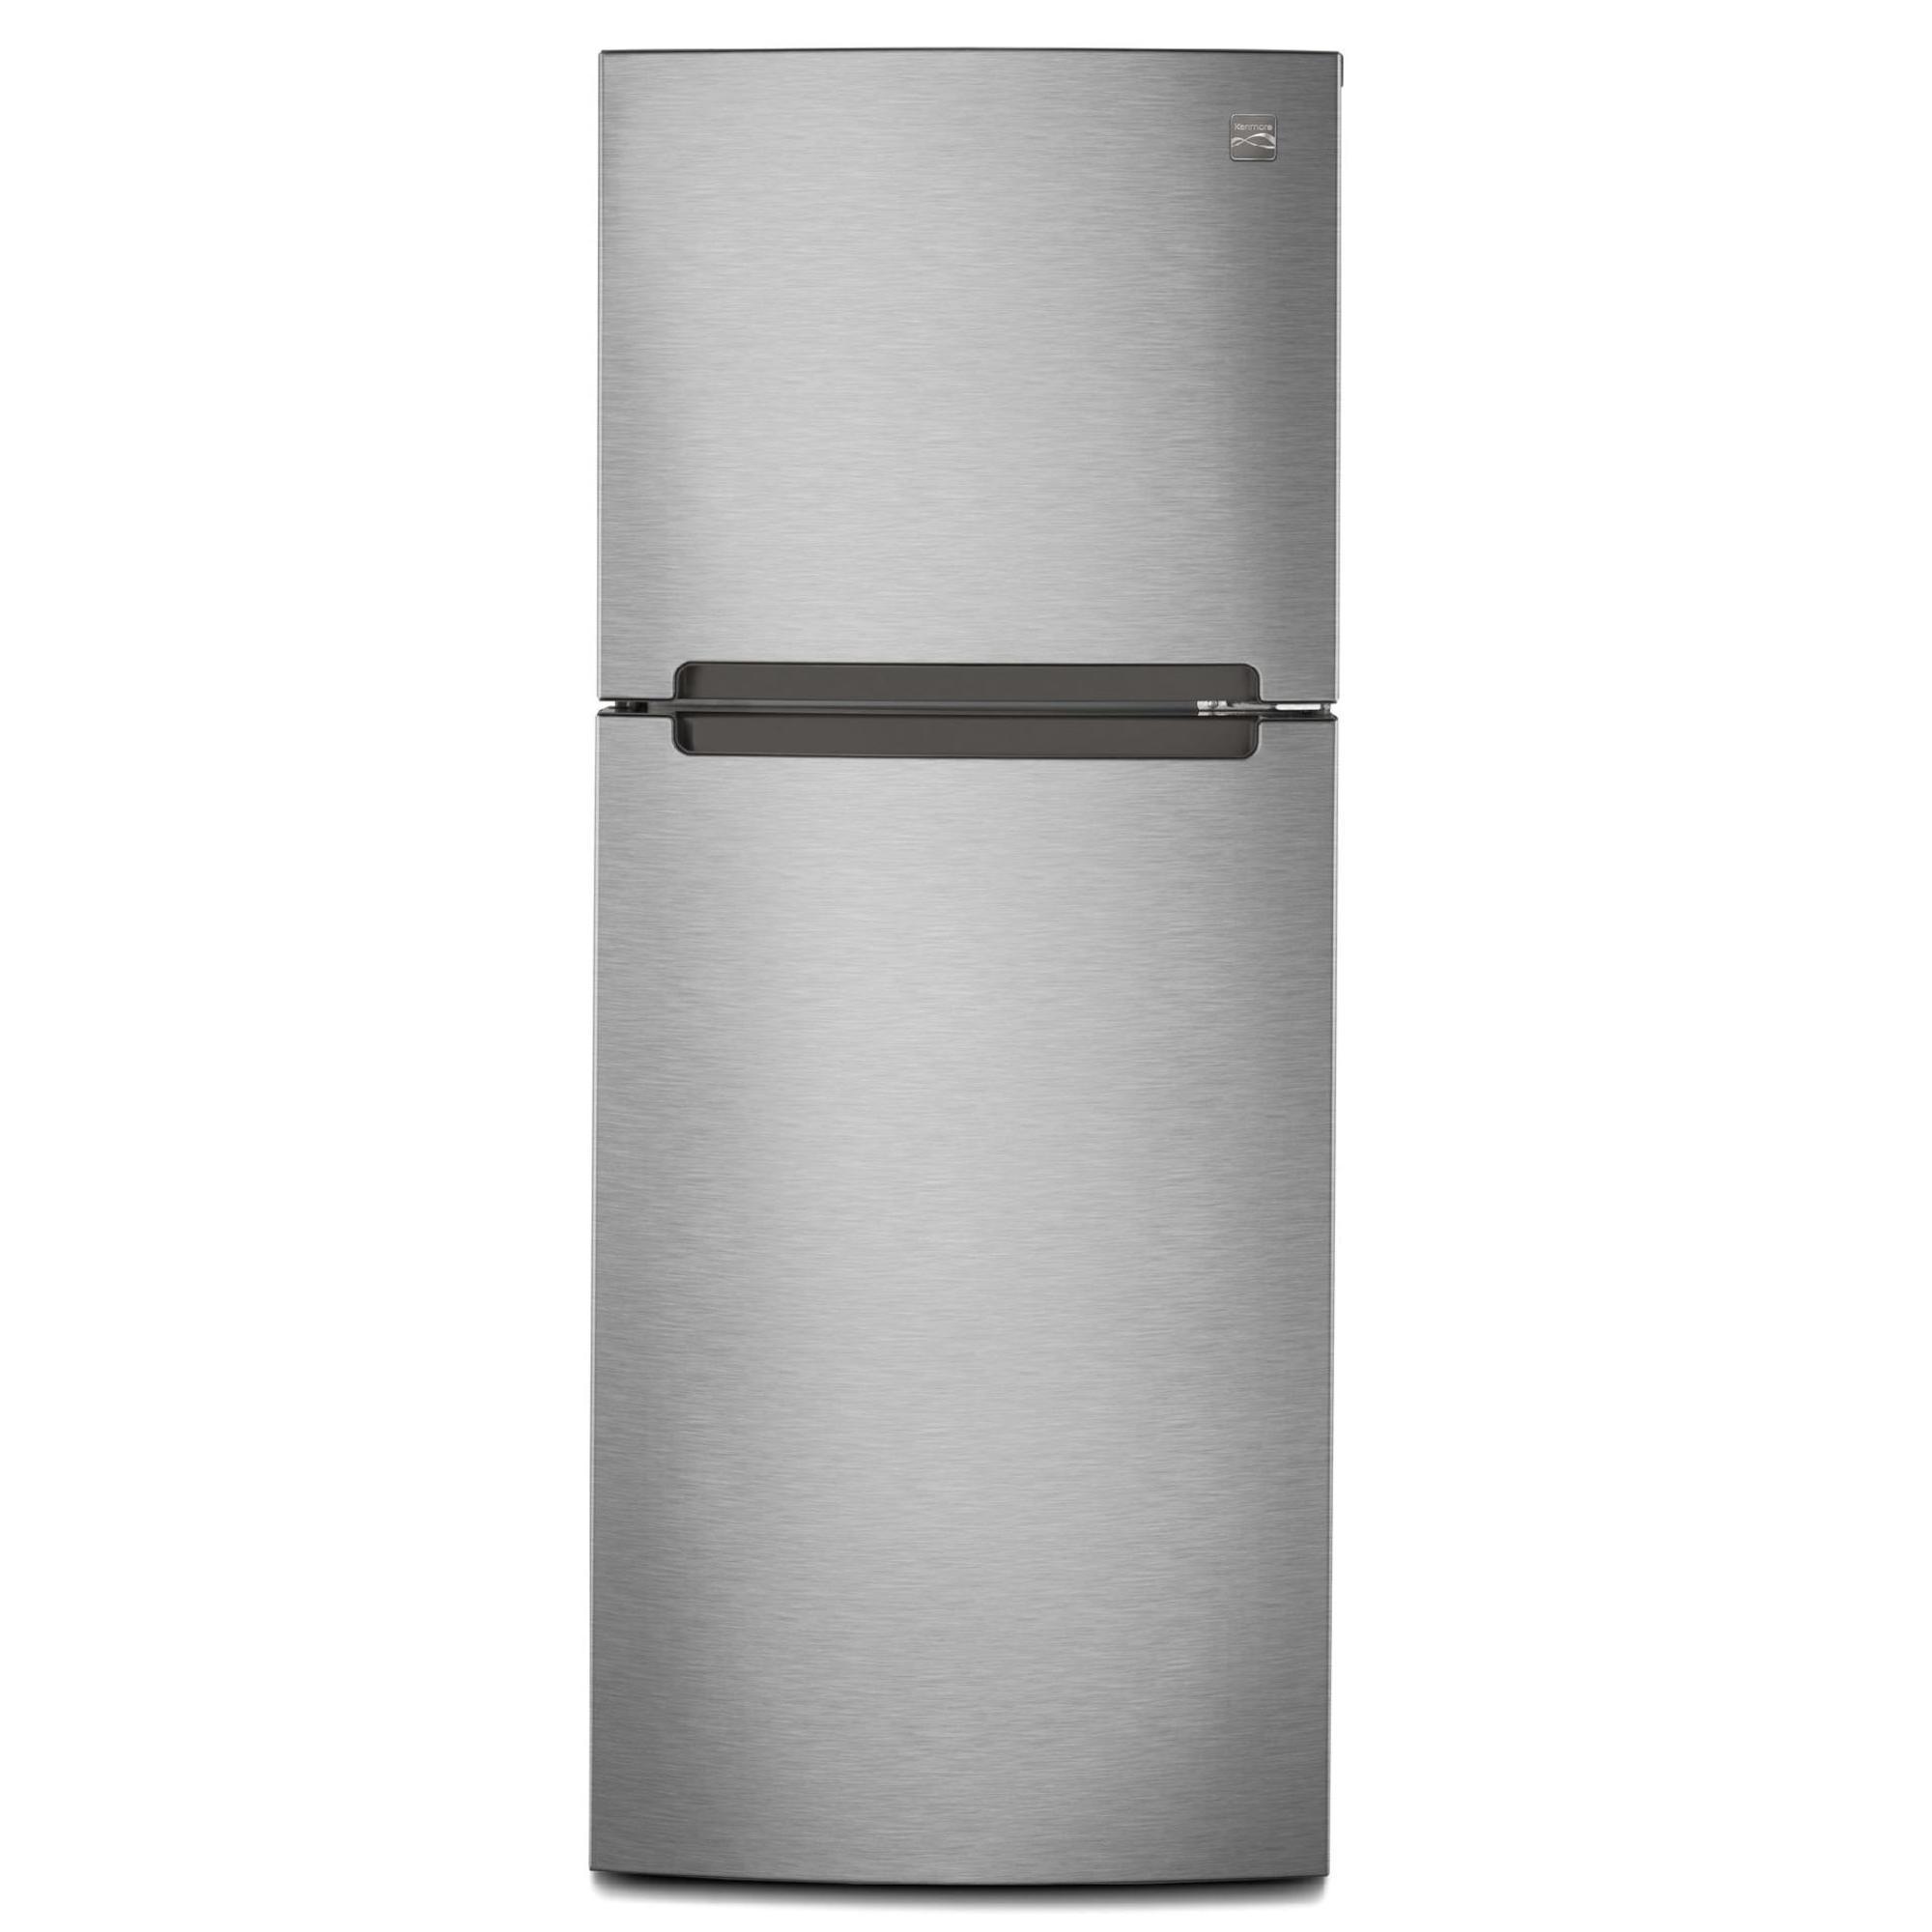 Kenmore 76393 76393 10 7 Cu Ft Top Freezer Refrigerator W